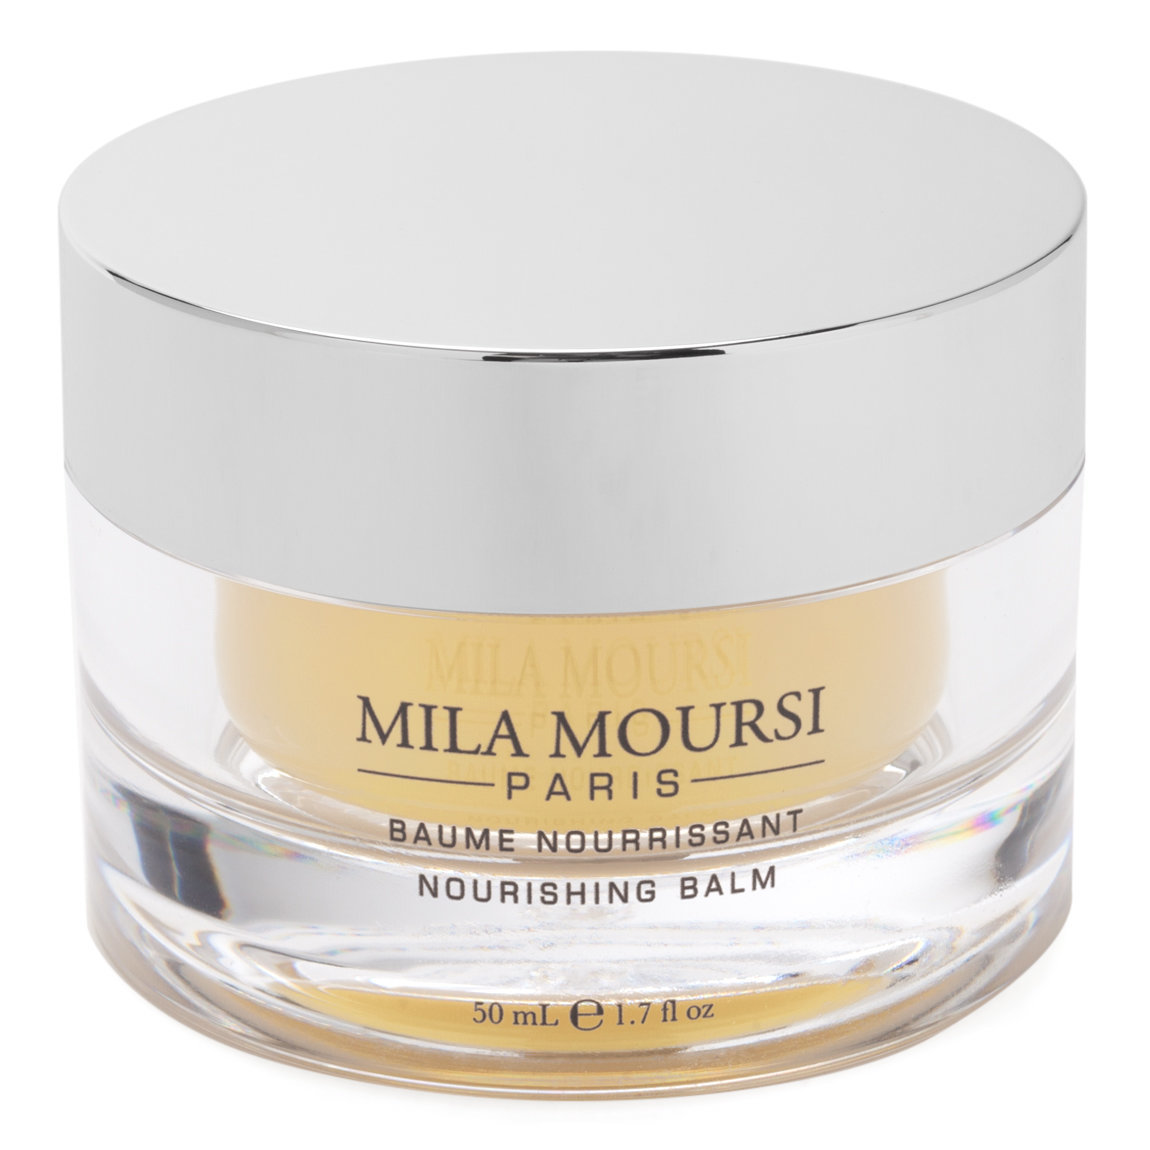 Mila Moursi Nourishing Balm product swatch.